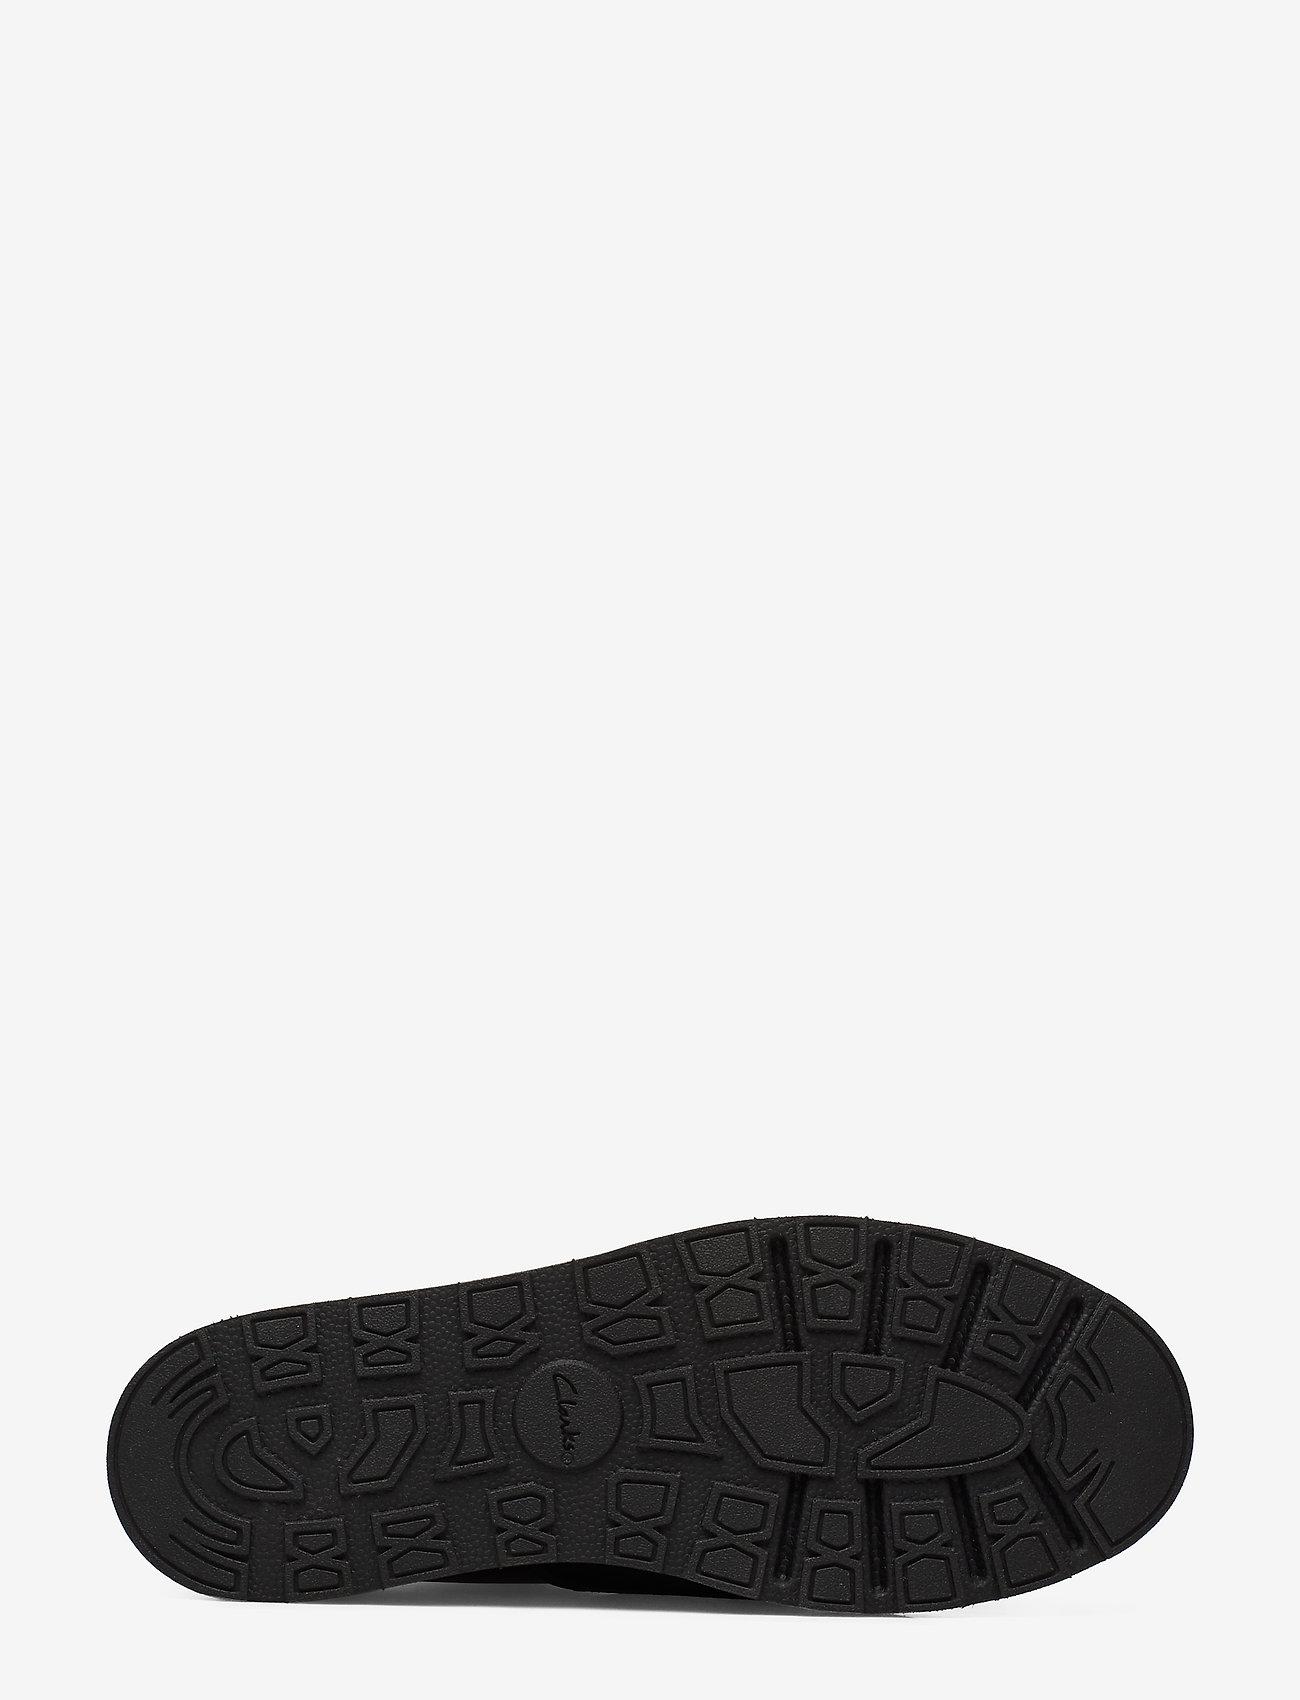 Särskild rabattTrace Walk Black Leather 1049.25 Clarks ssGOI UMGYn